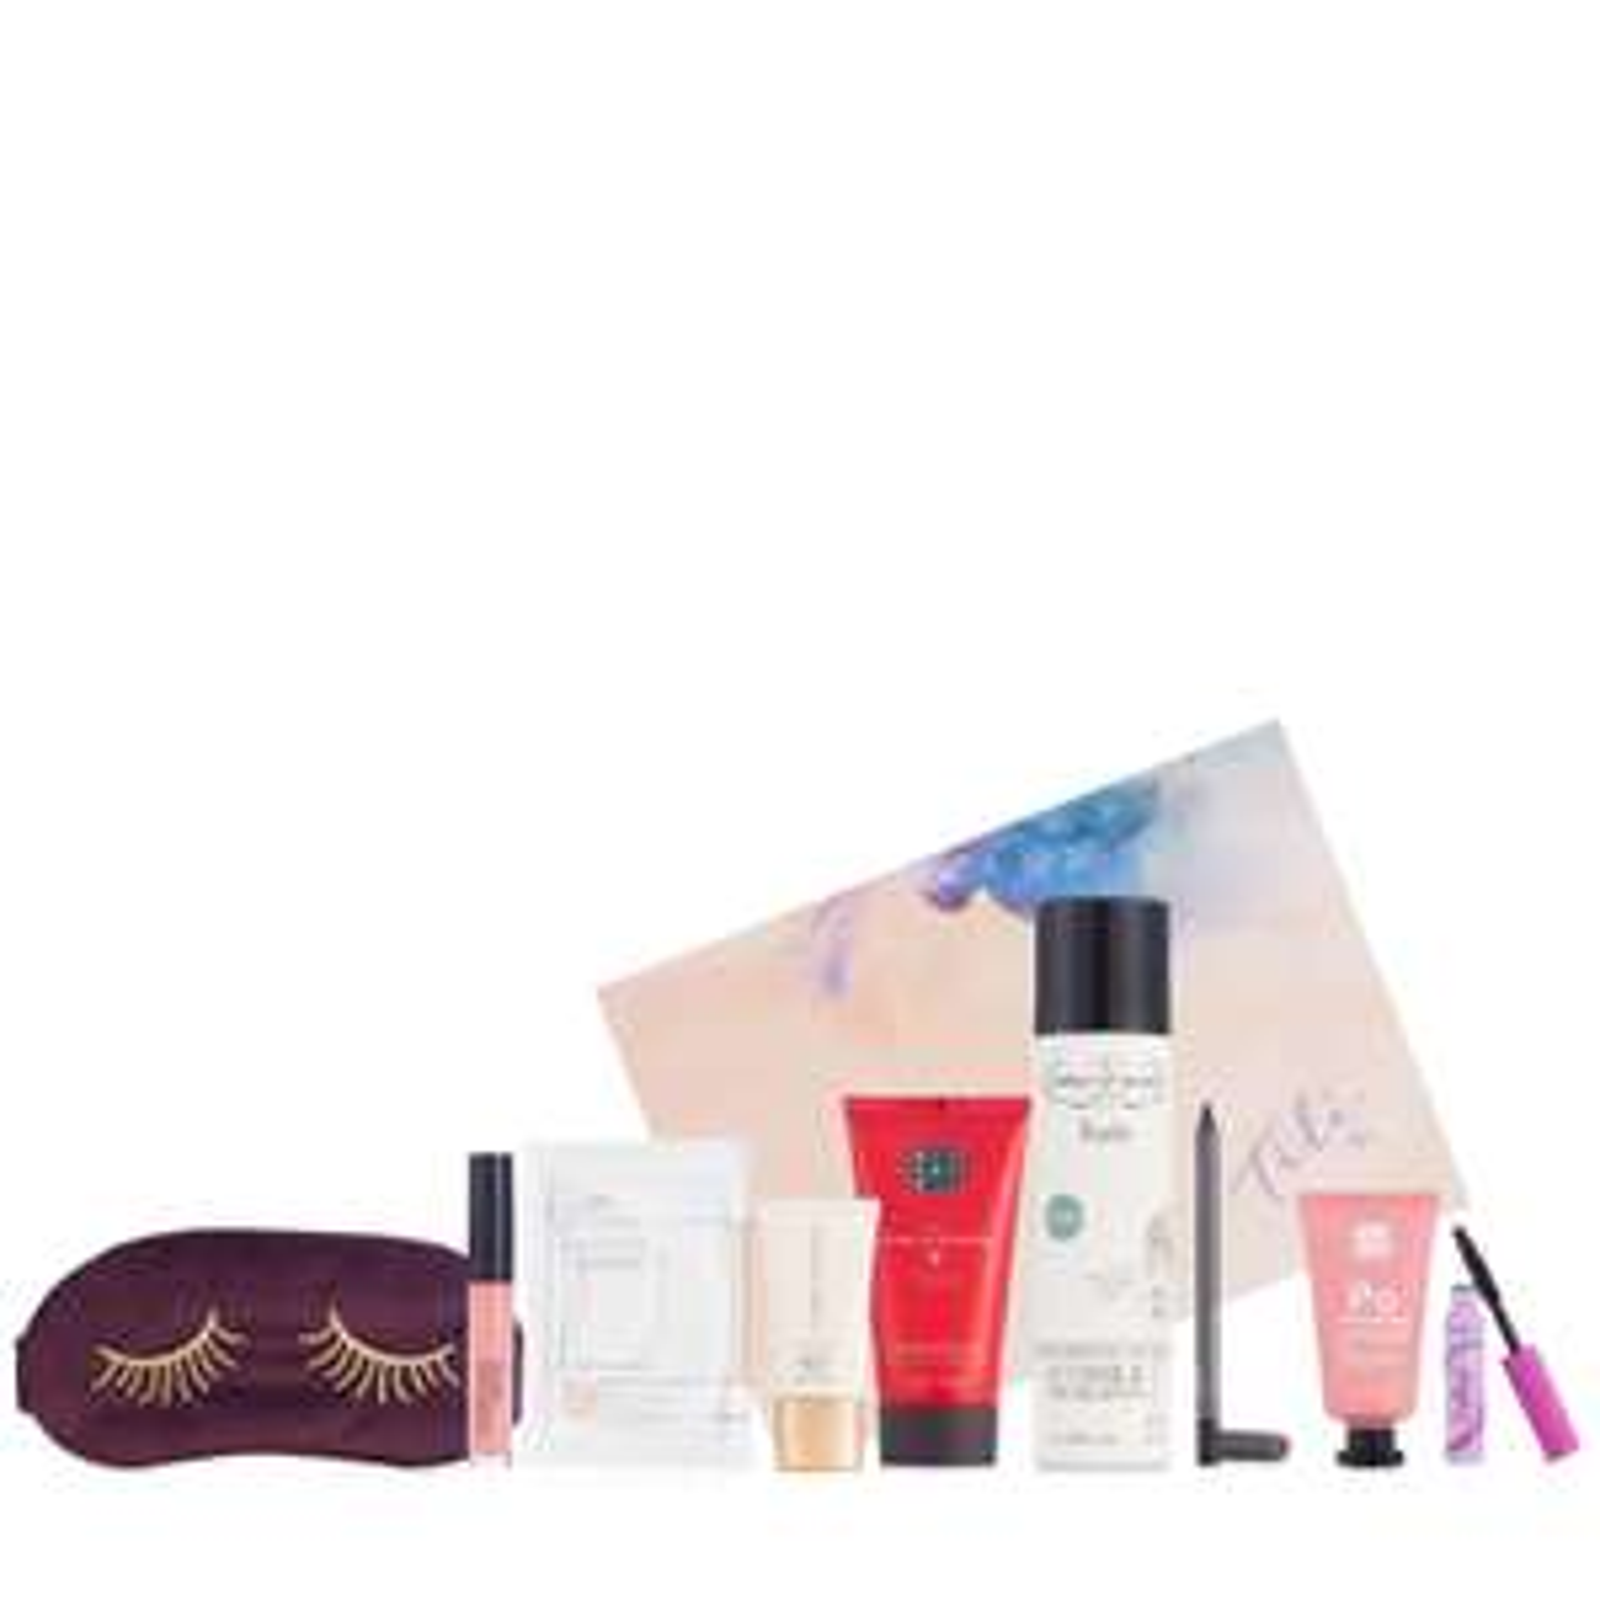 Tili Beauty Boxes £10 Each Delivered @ QVC UK